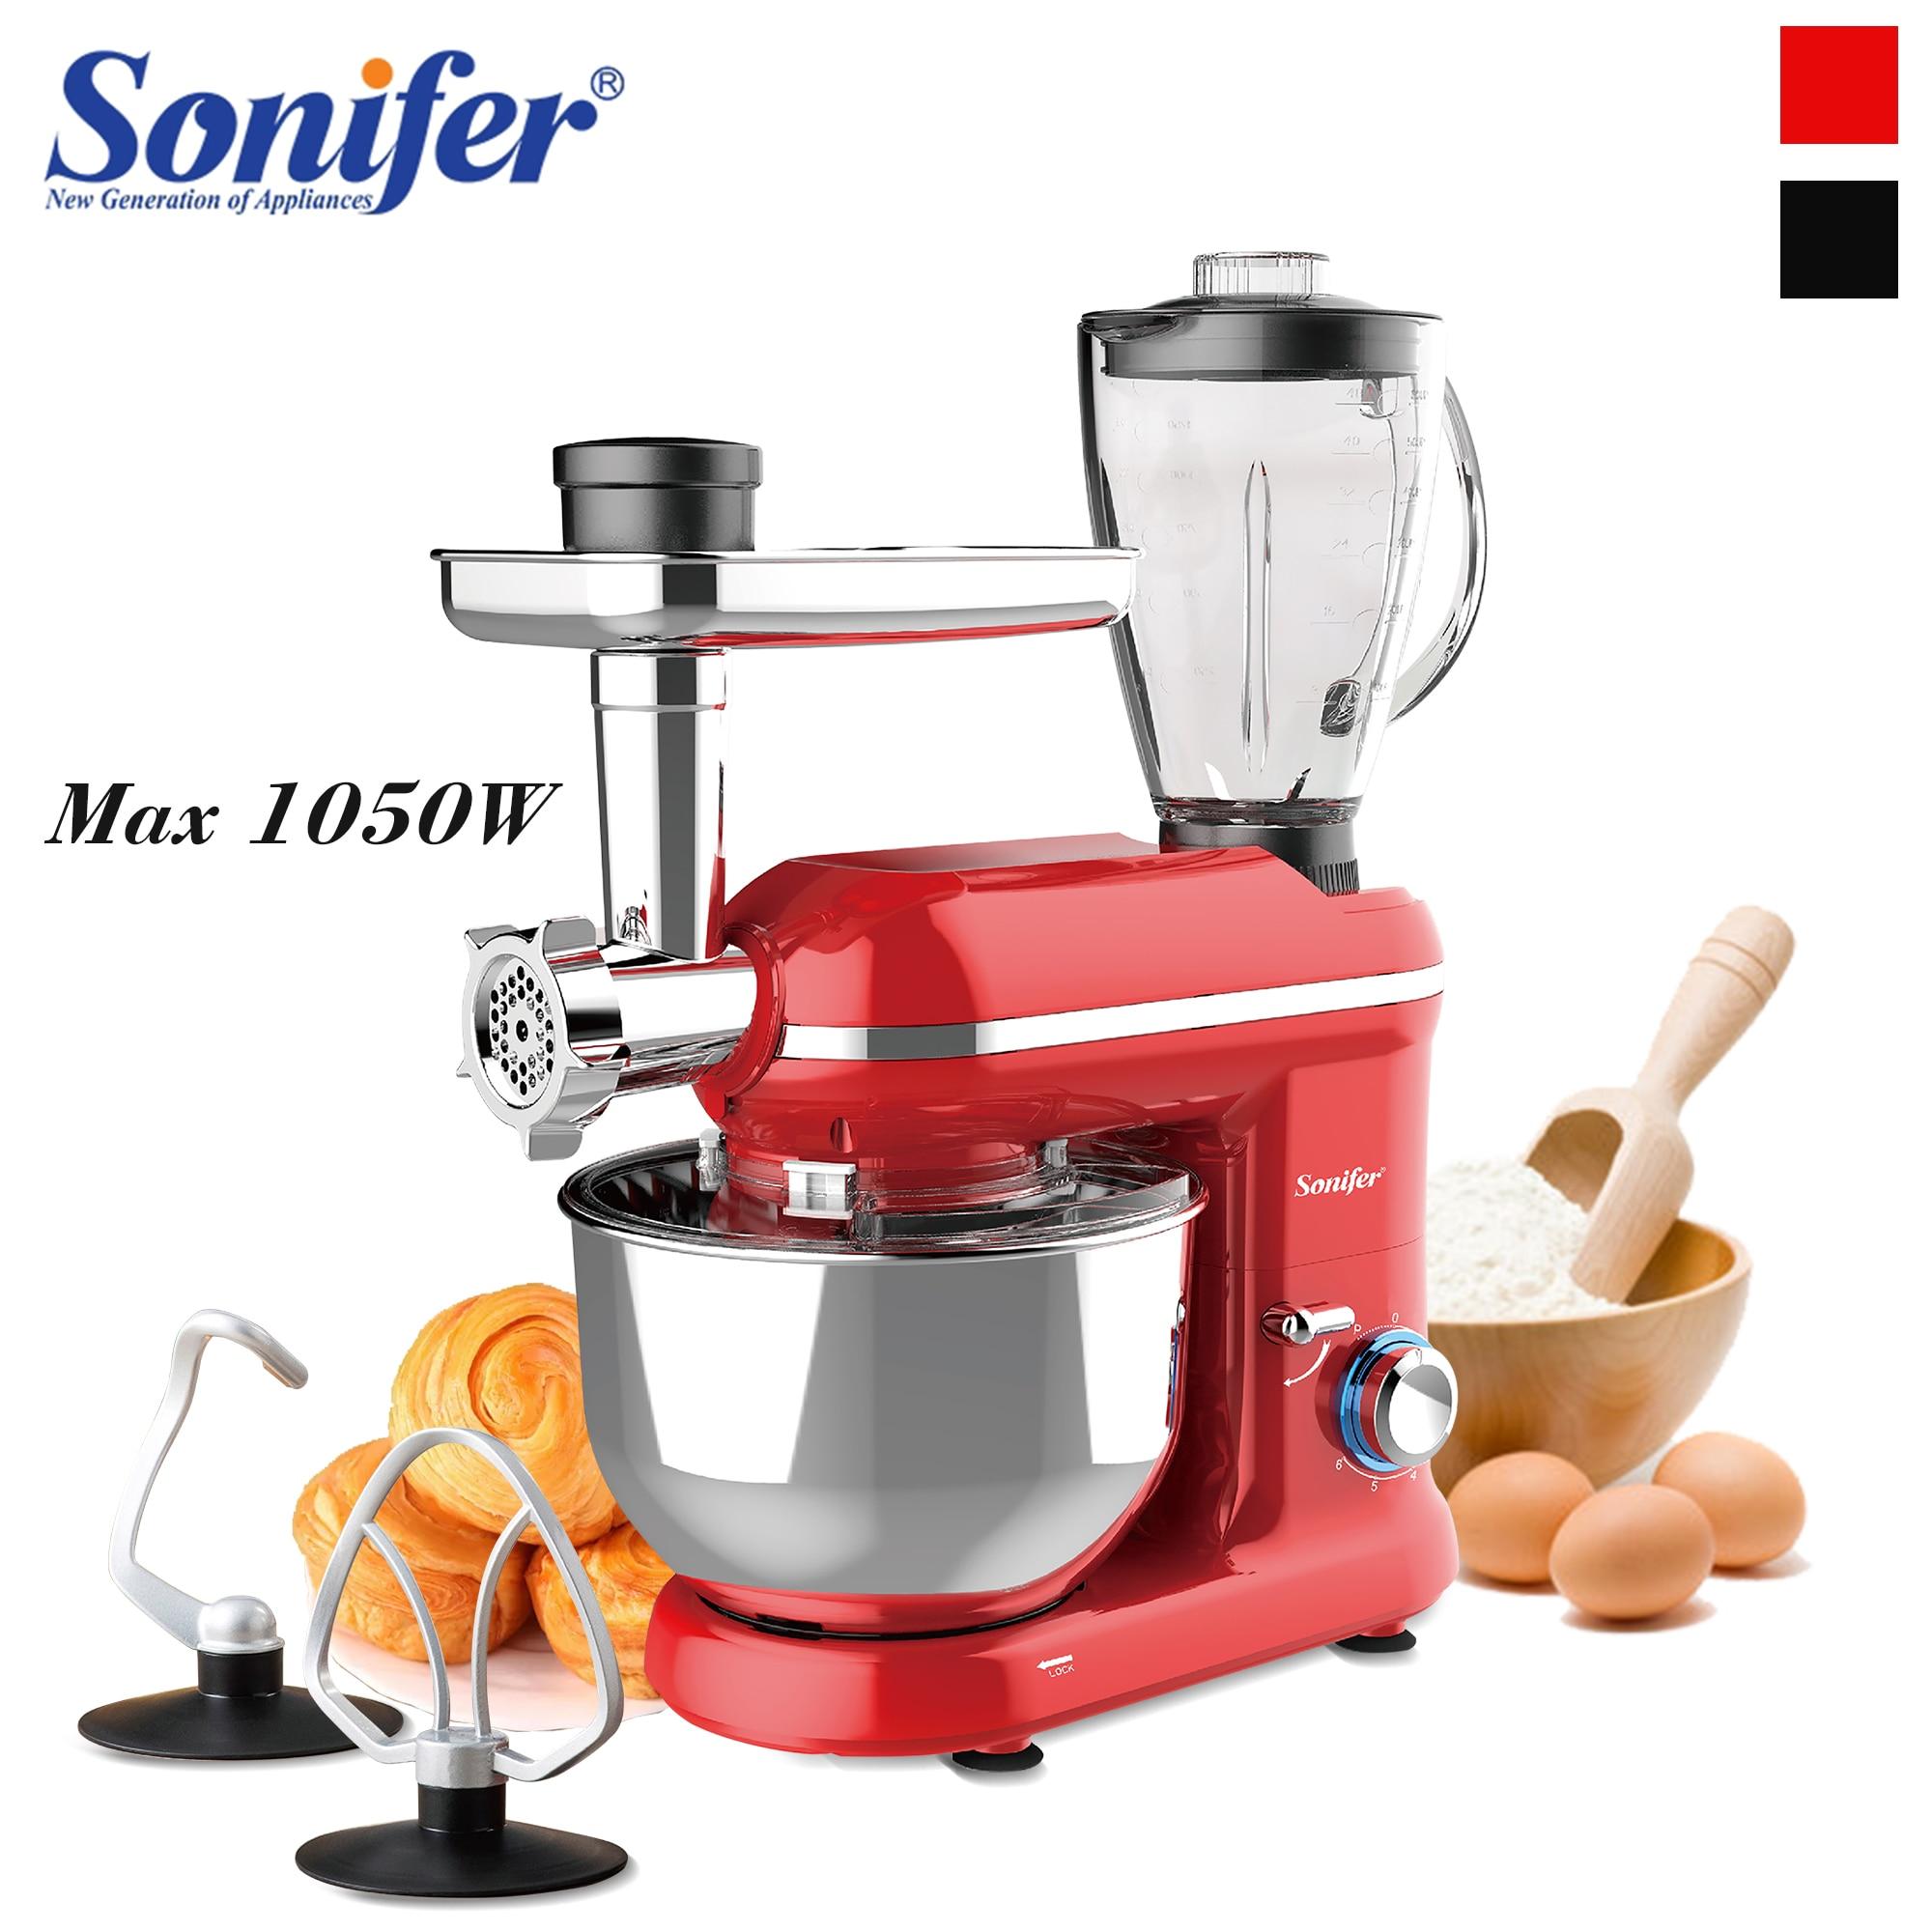 1050W 5.5L Kitchen Food Stand Mixer 6-Speed 3in1 Household Kitchen Meat Grinder Blender Juicer Cake Dough Bread Mixer Sonifer